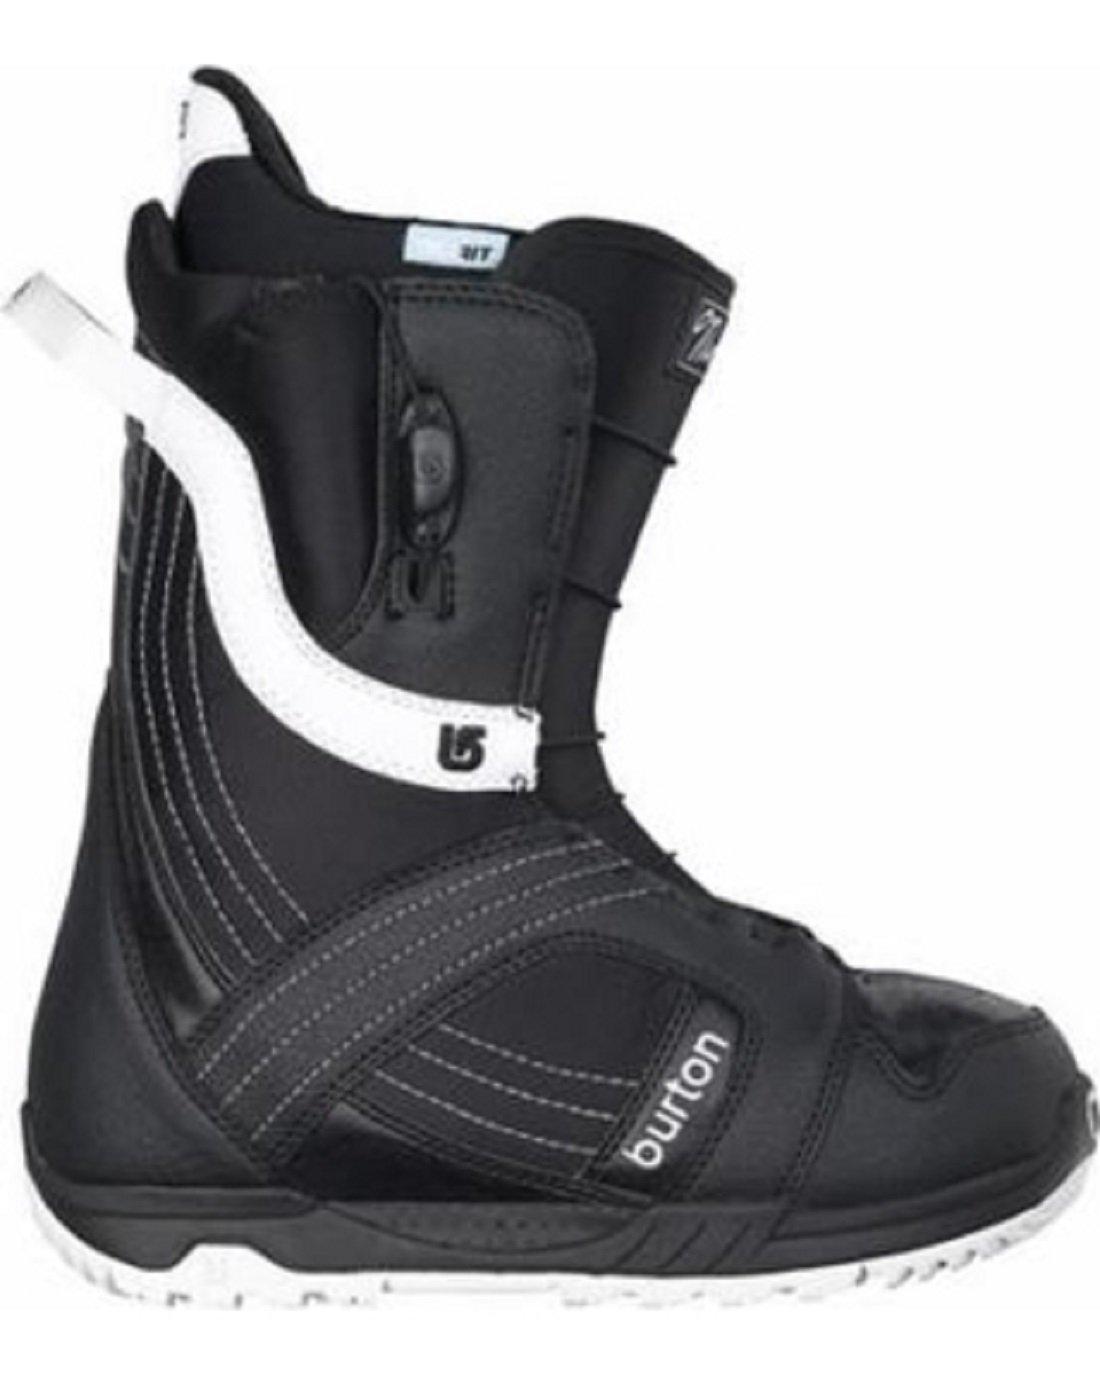 Burton Mint Snowboard Boot (Black/White, 6.0) by Burton